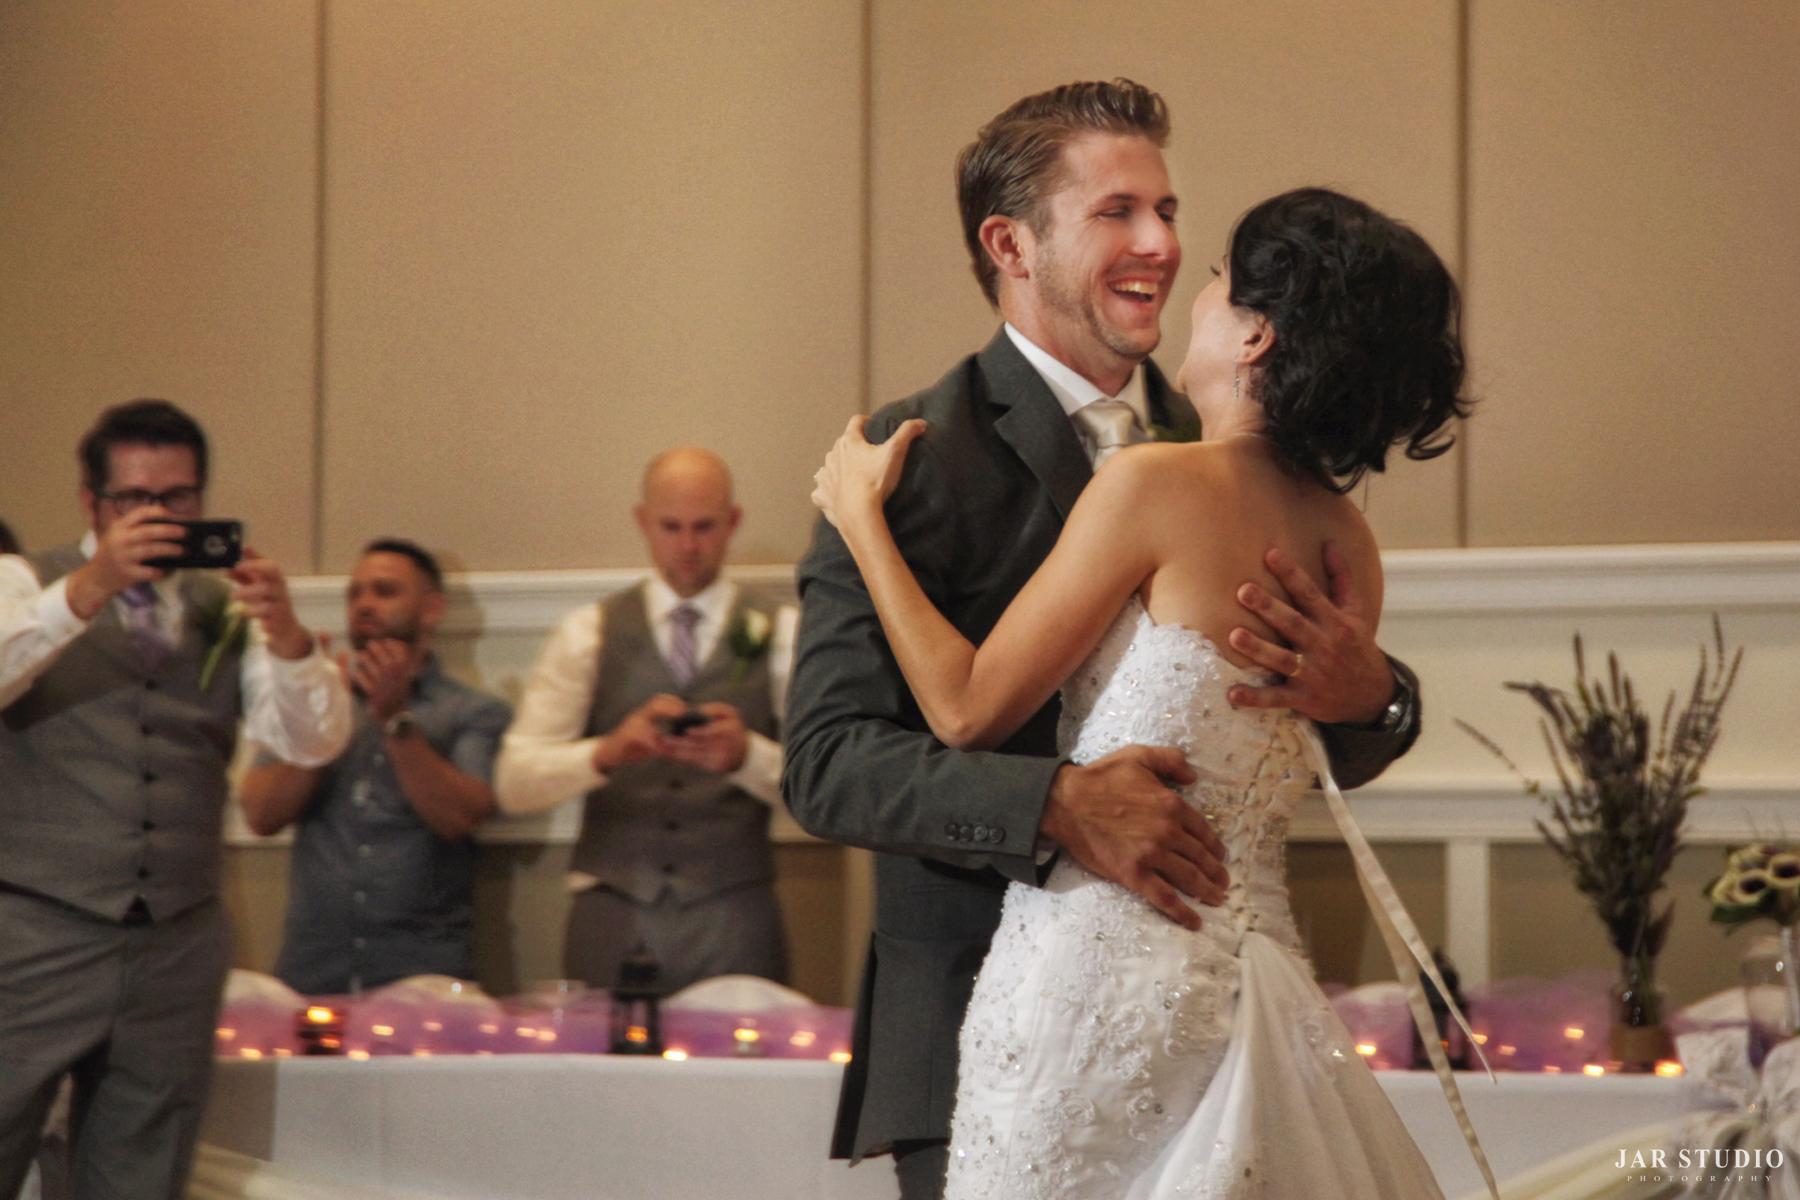 z-Lakeshore-Center-wedding-photographer-jarstudio (3).JPG